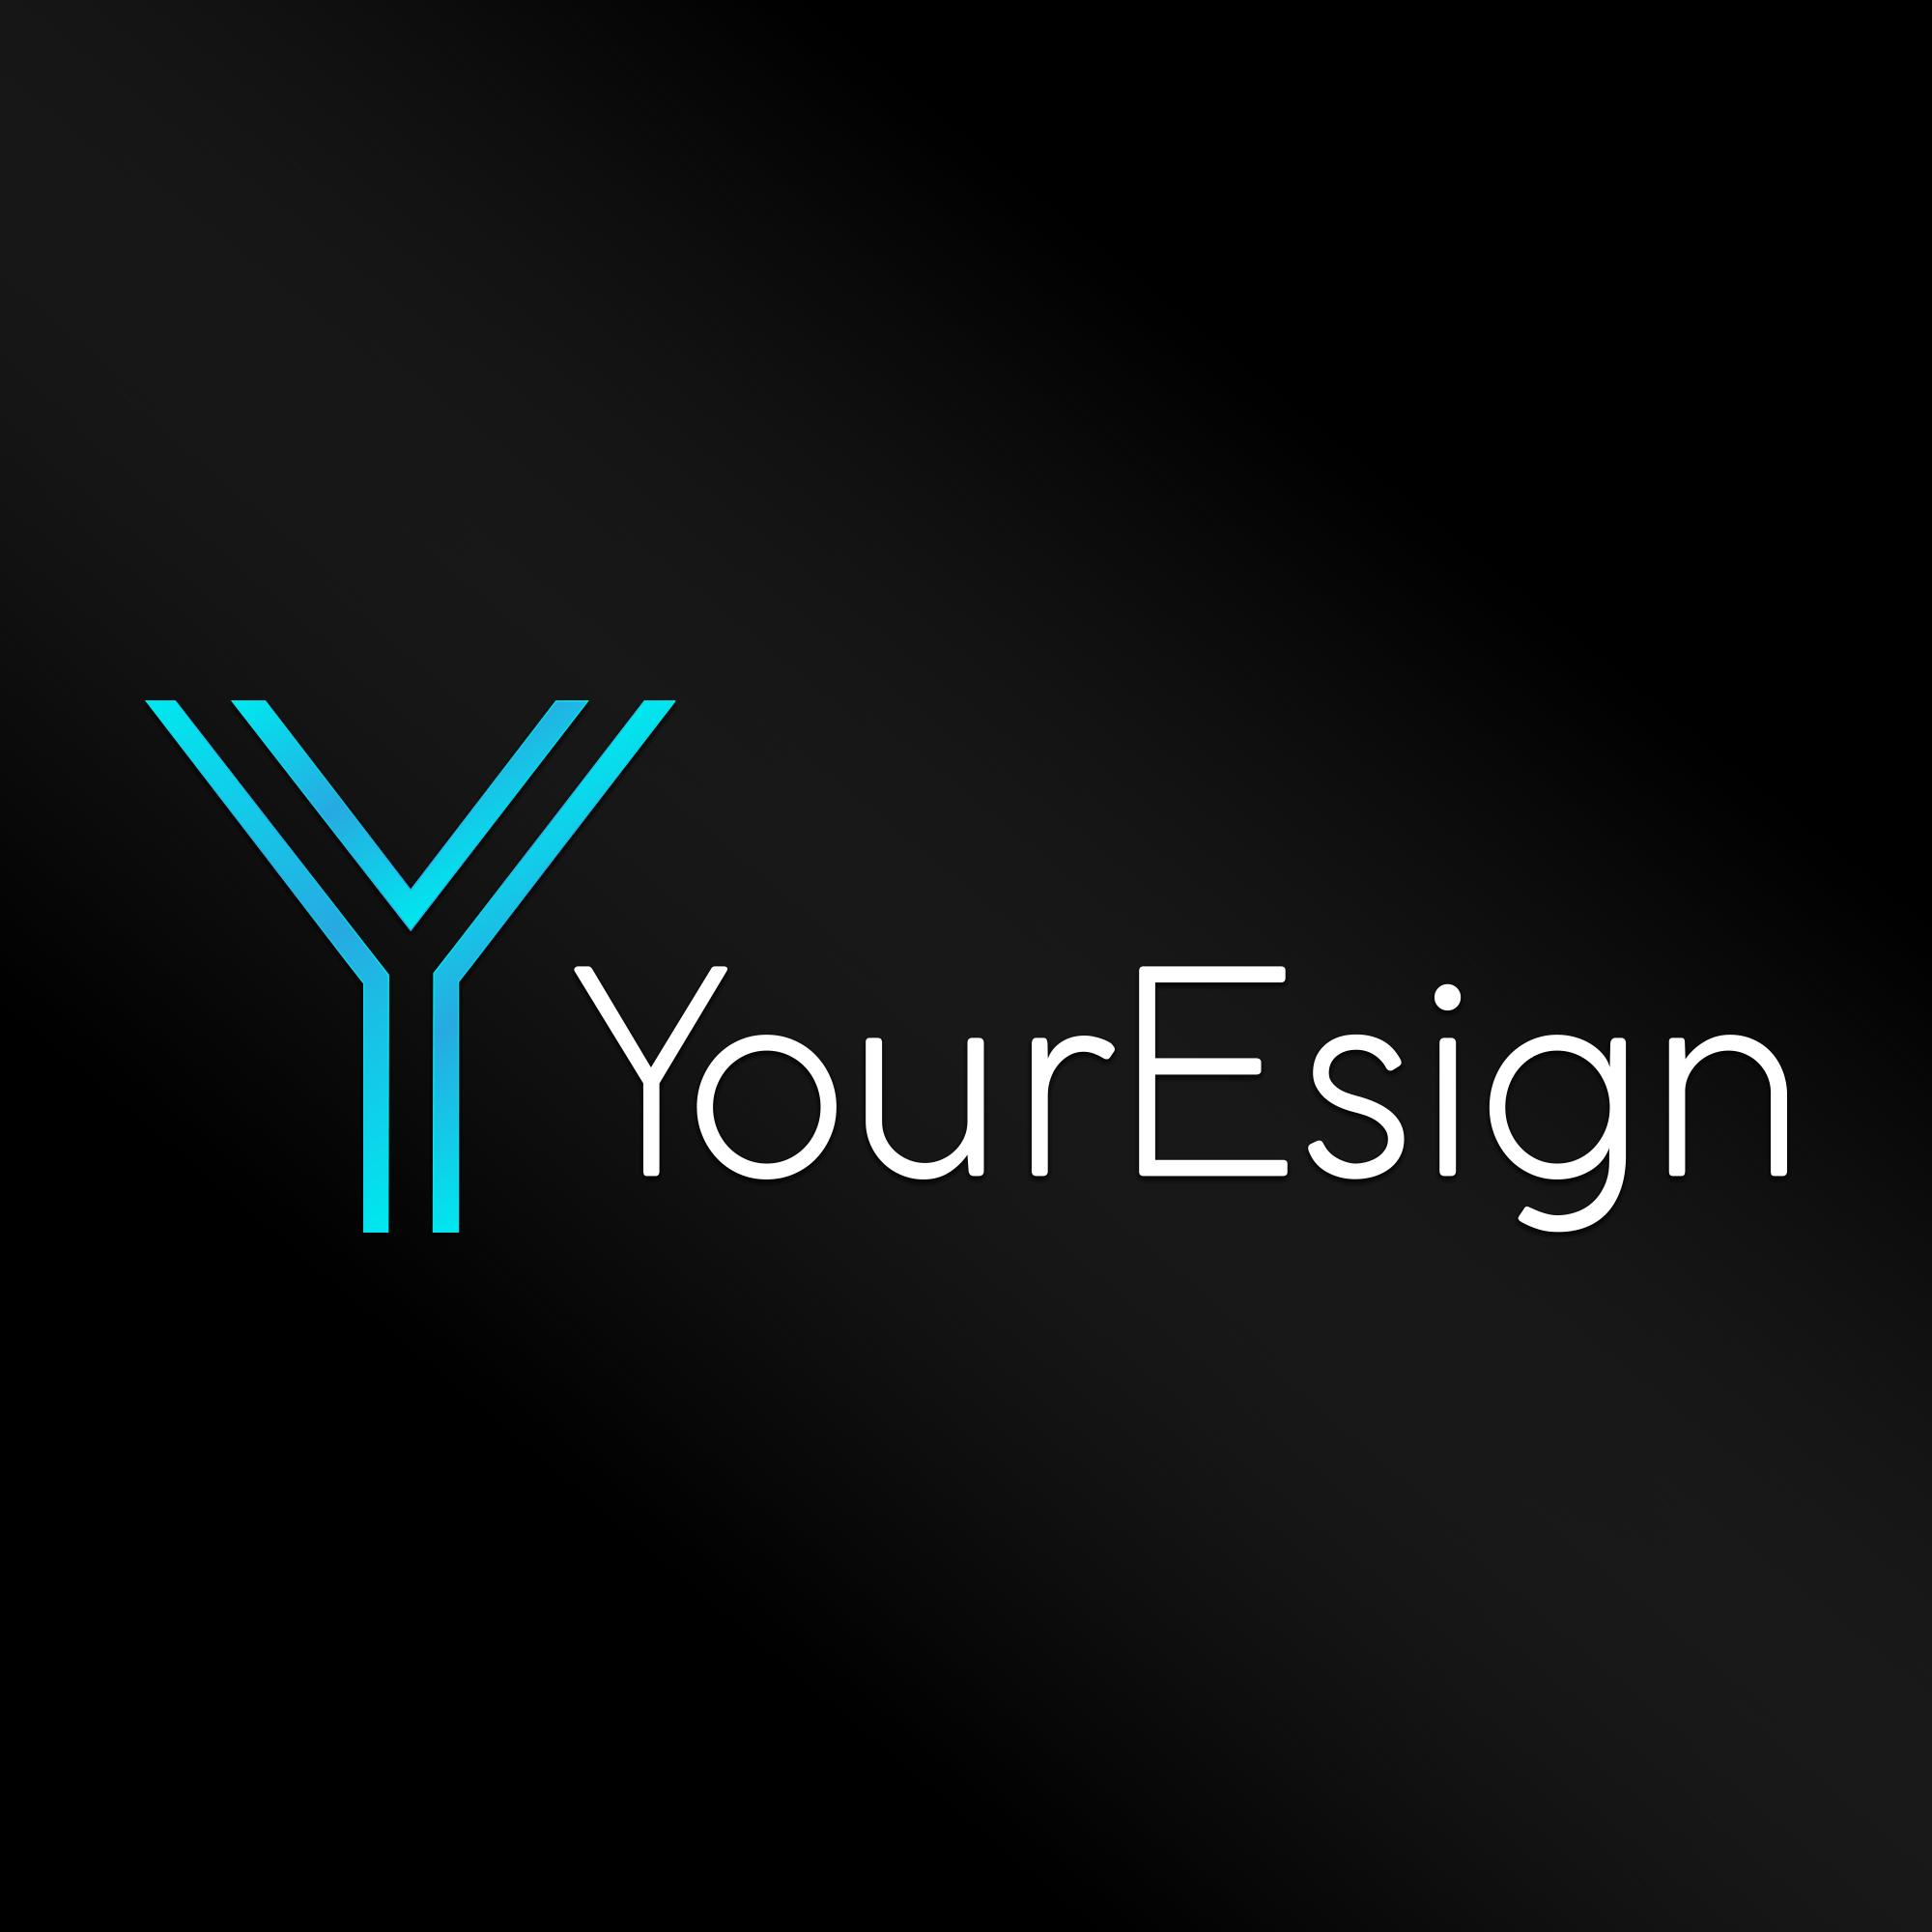 YourEsign